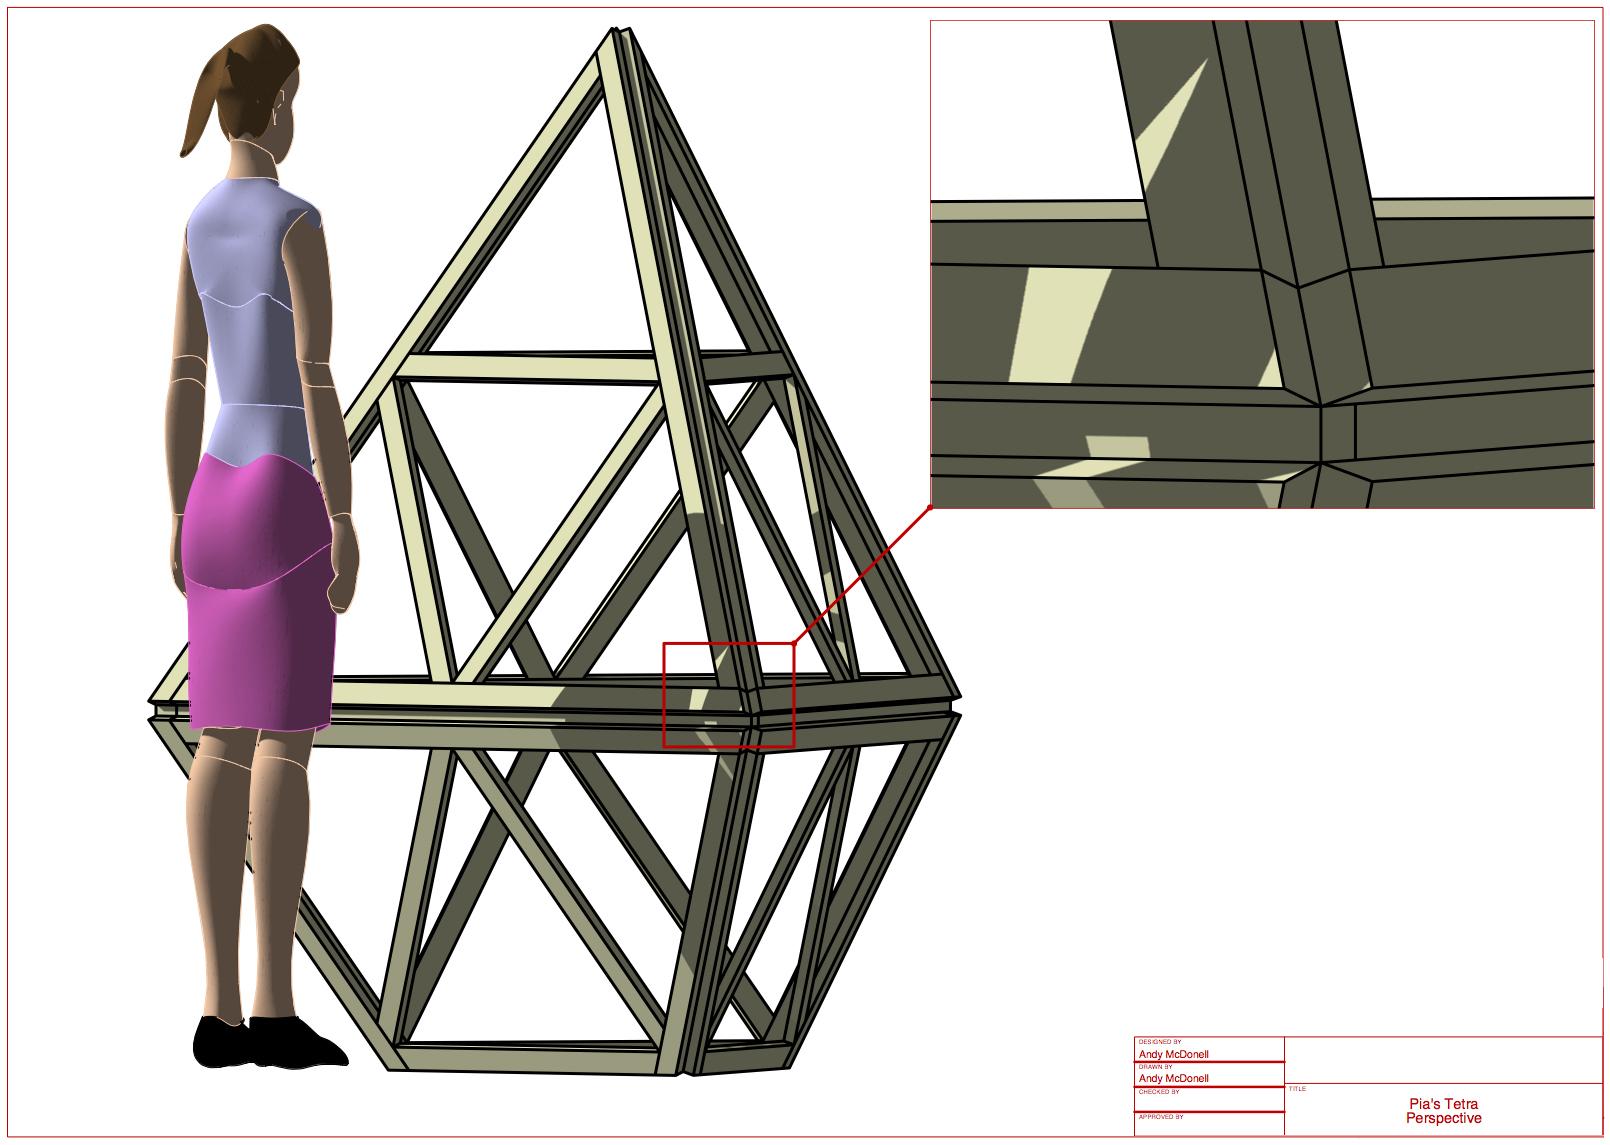 Pia's Tetrahedron #2.jpg